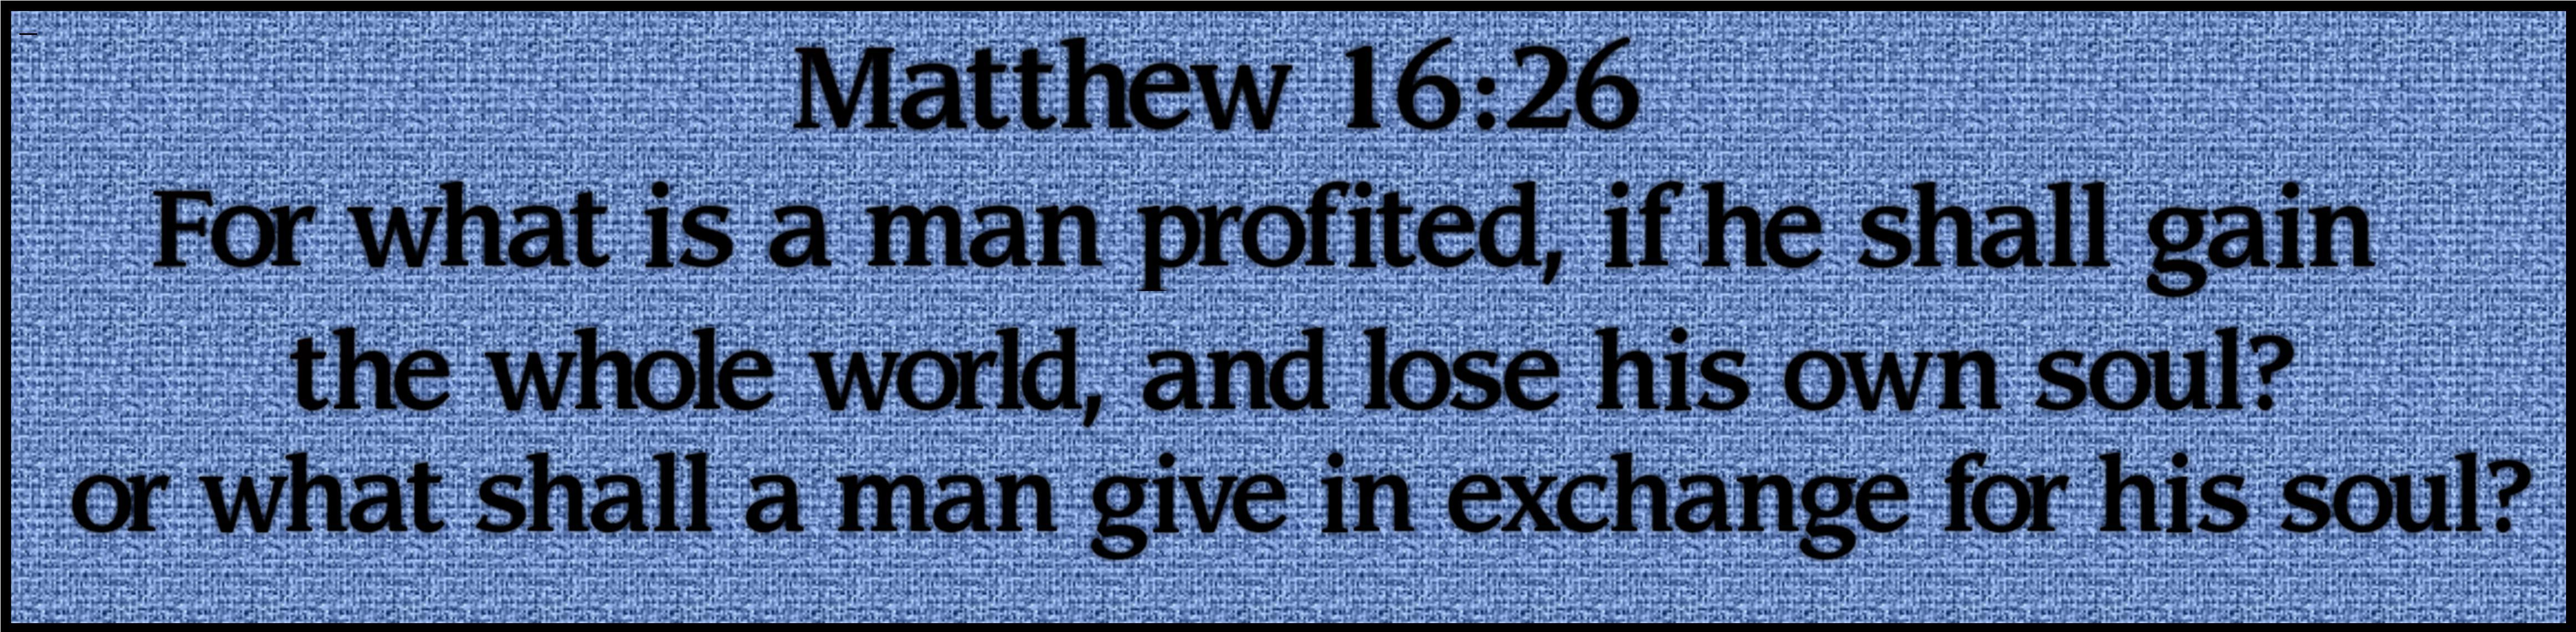 matthew 1626